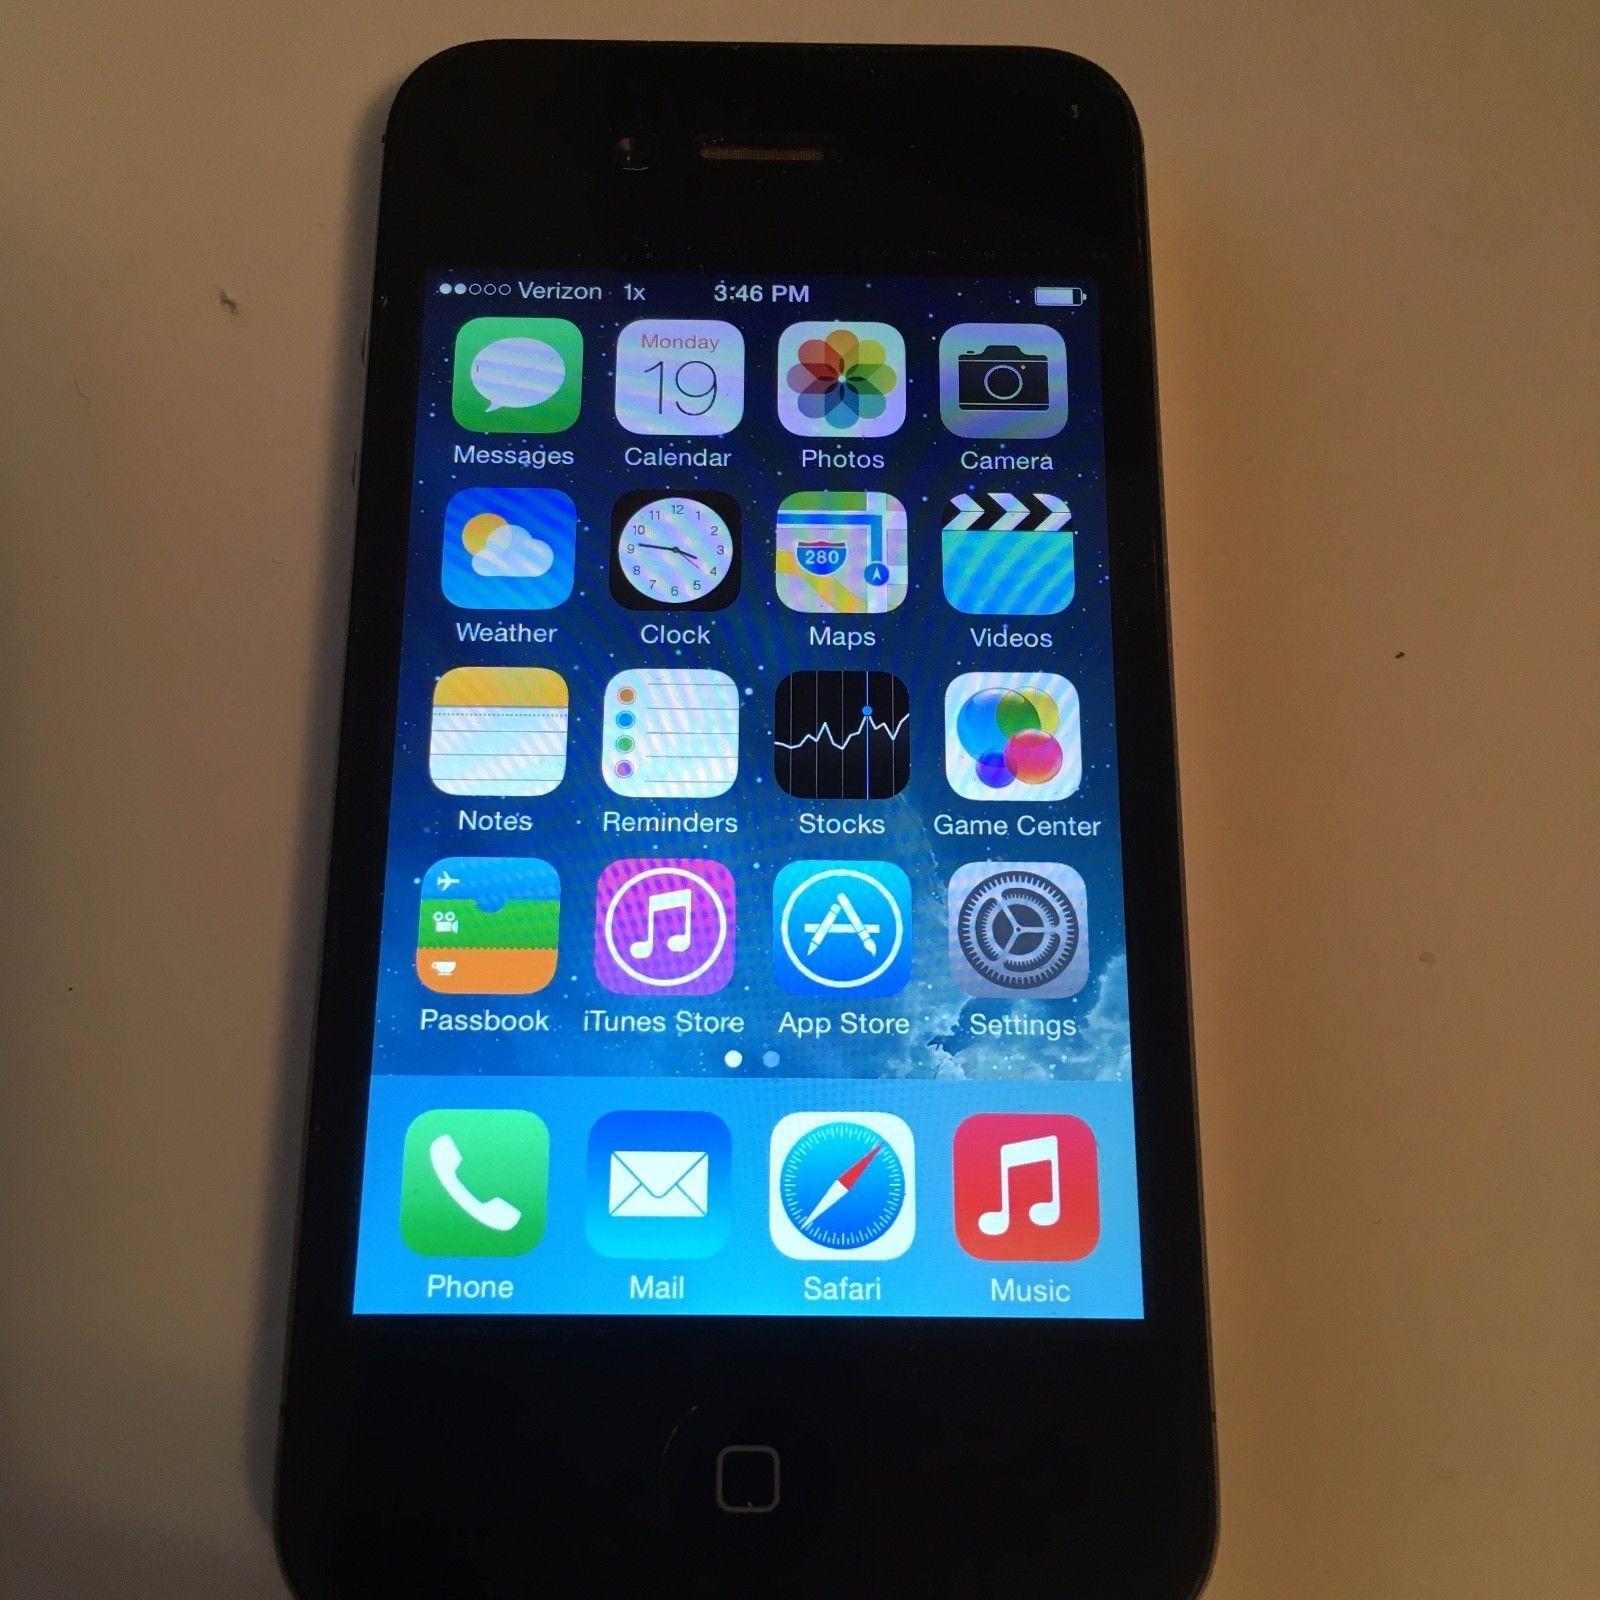 Apple iPhone 4 32 GB Verizon A1349 eBay Iphone, Apple